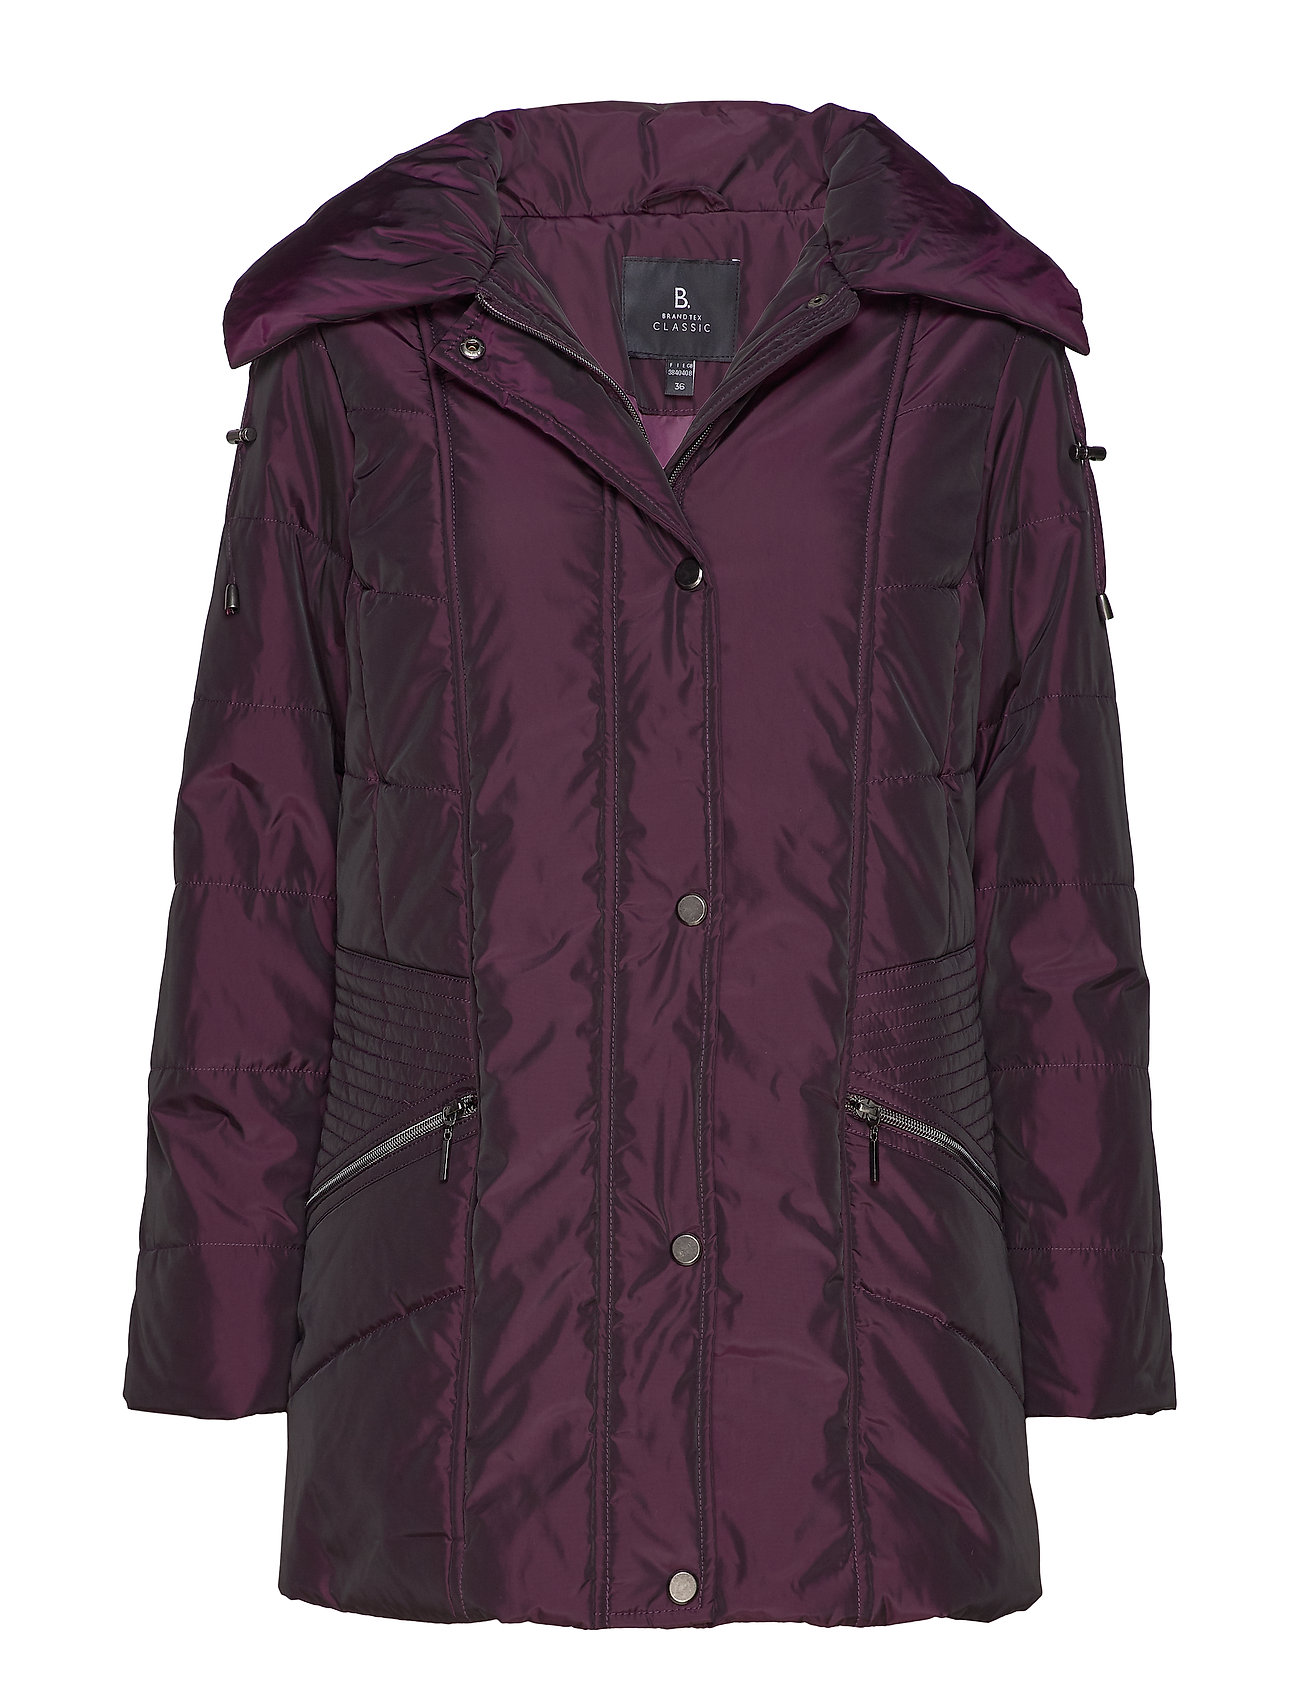 Brandtex Jacket Outerwear Heavy - DAHLIA